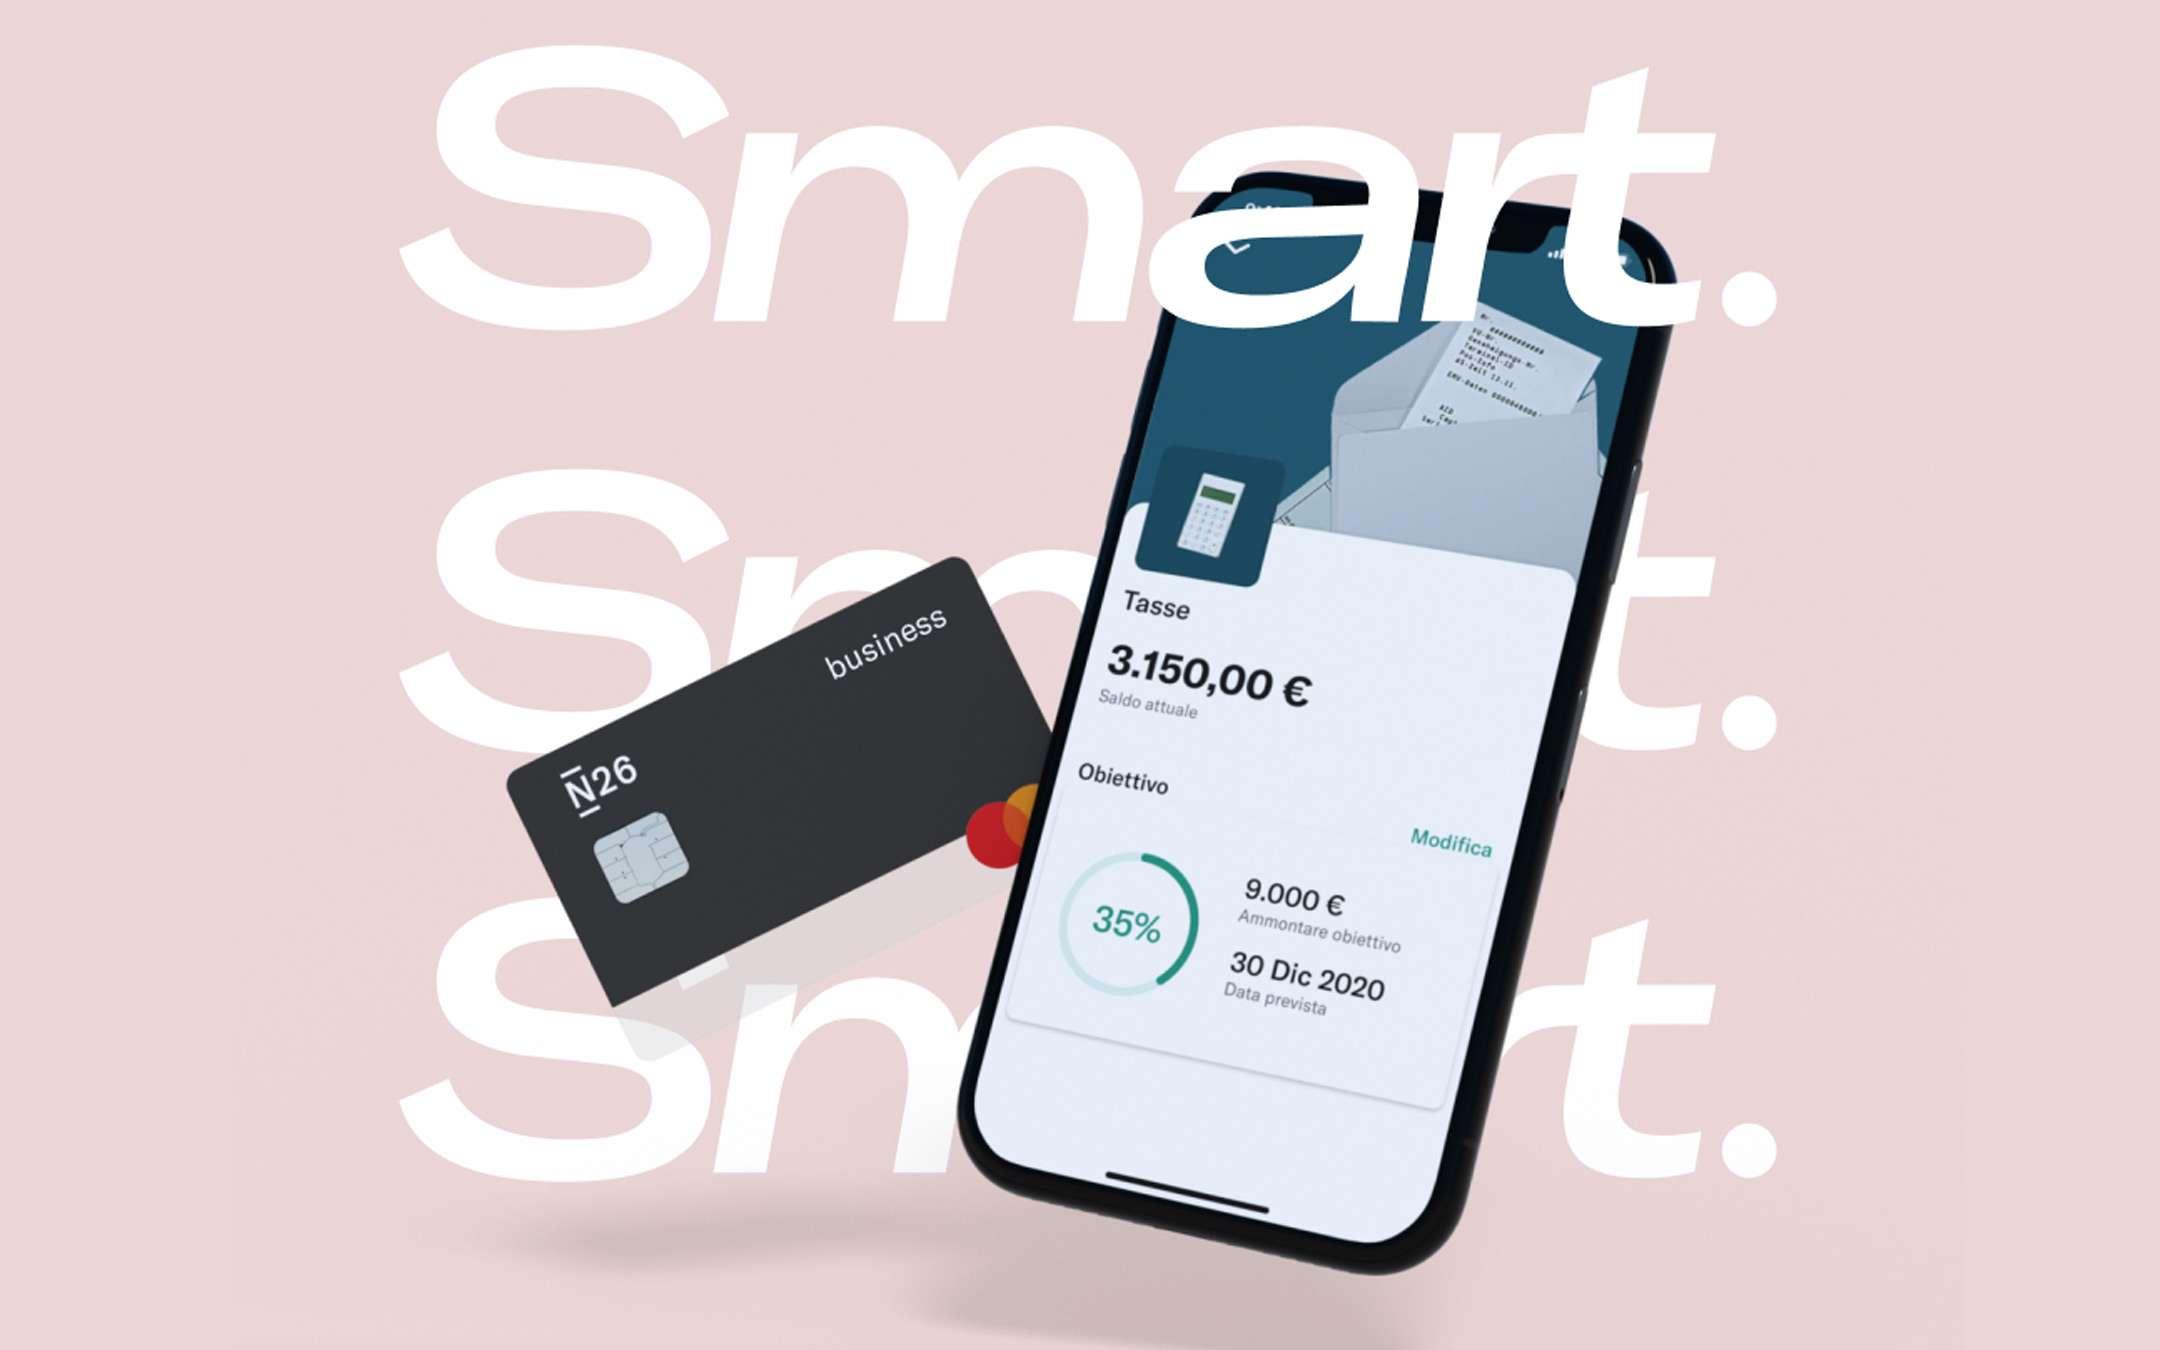 N26 Smart is born: the premium digital account